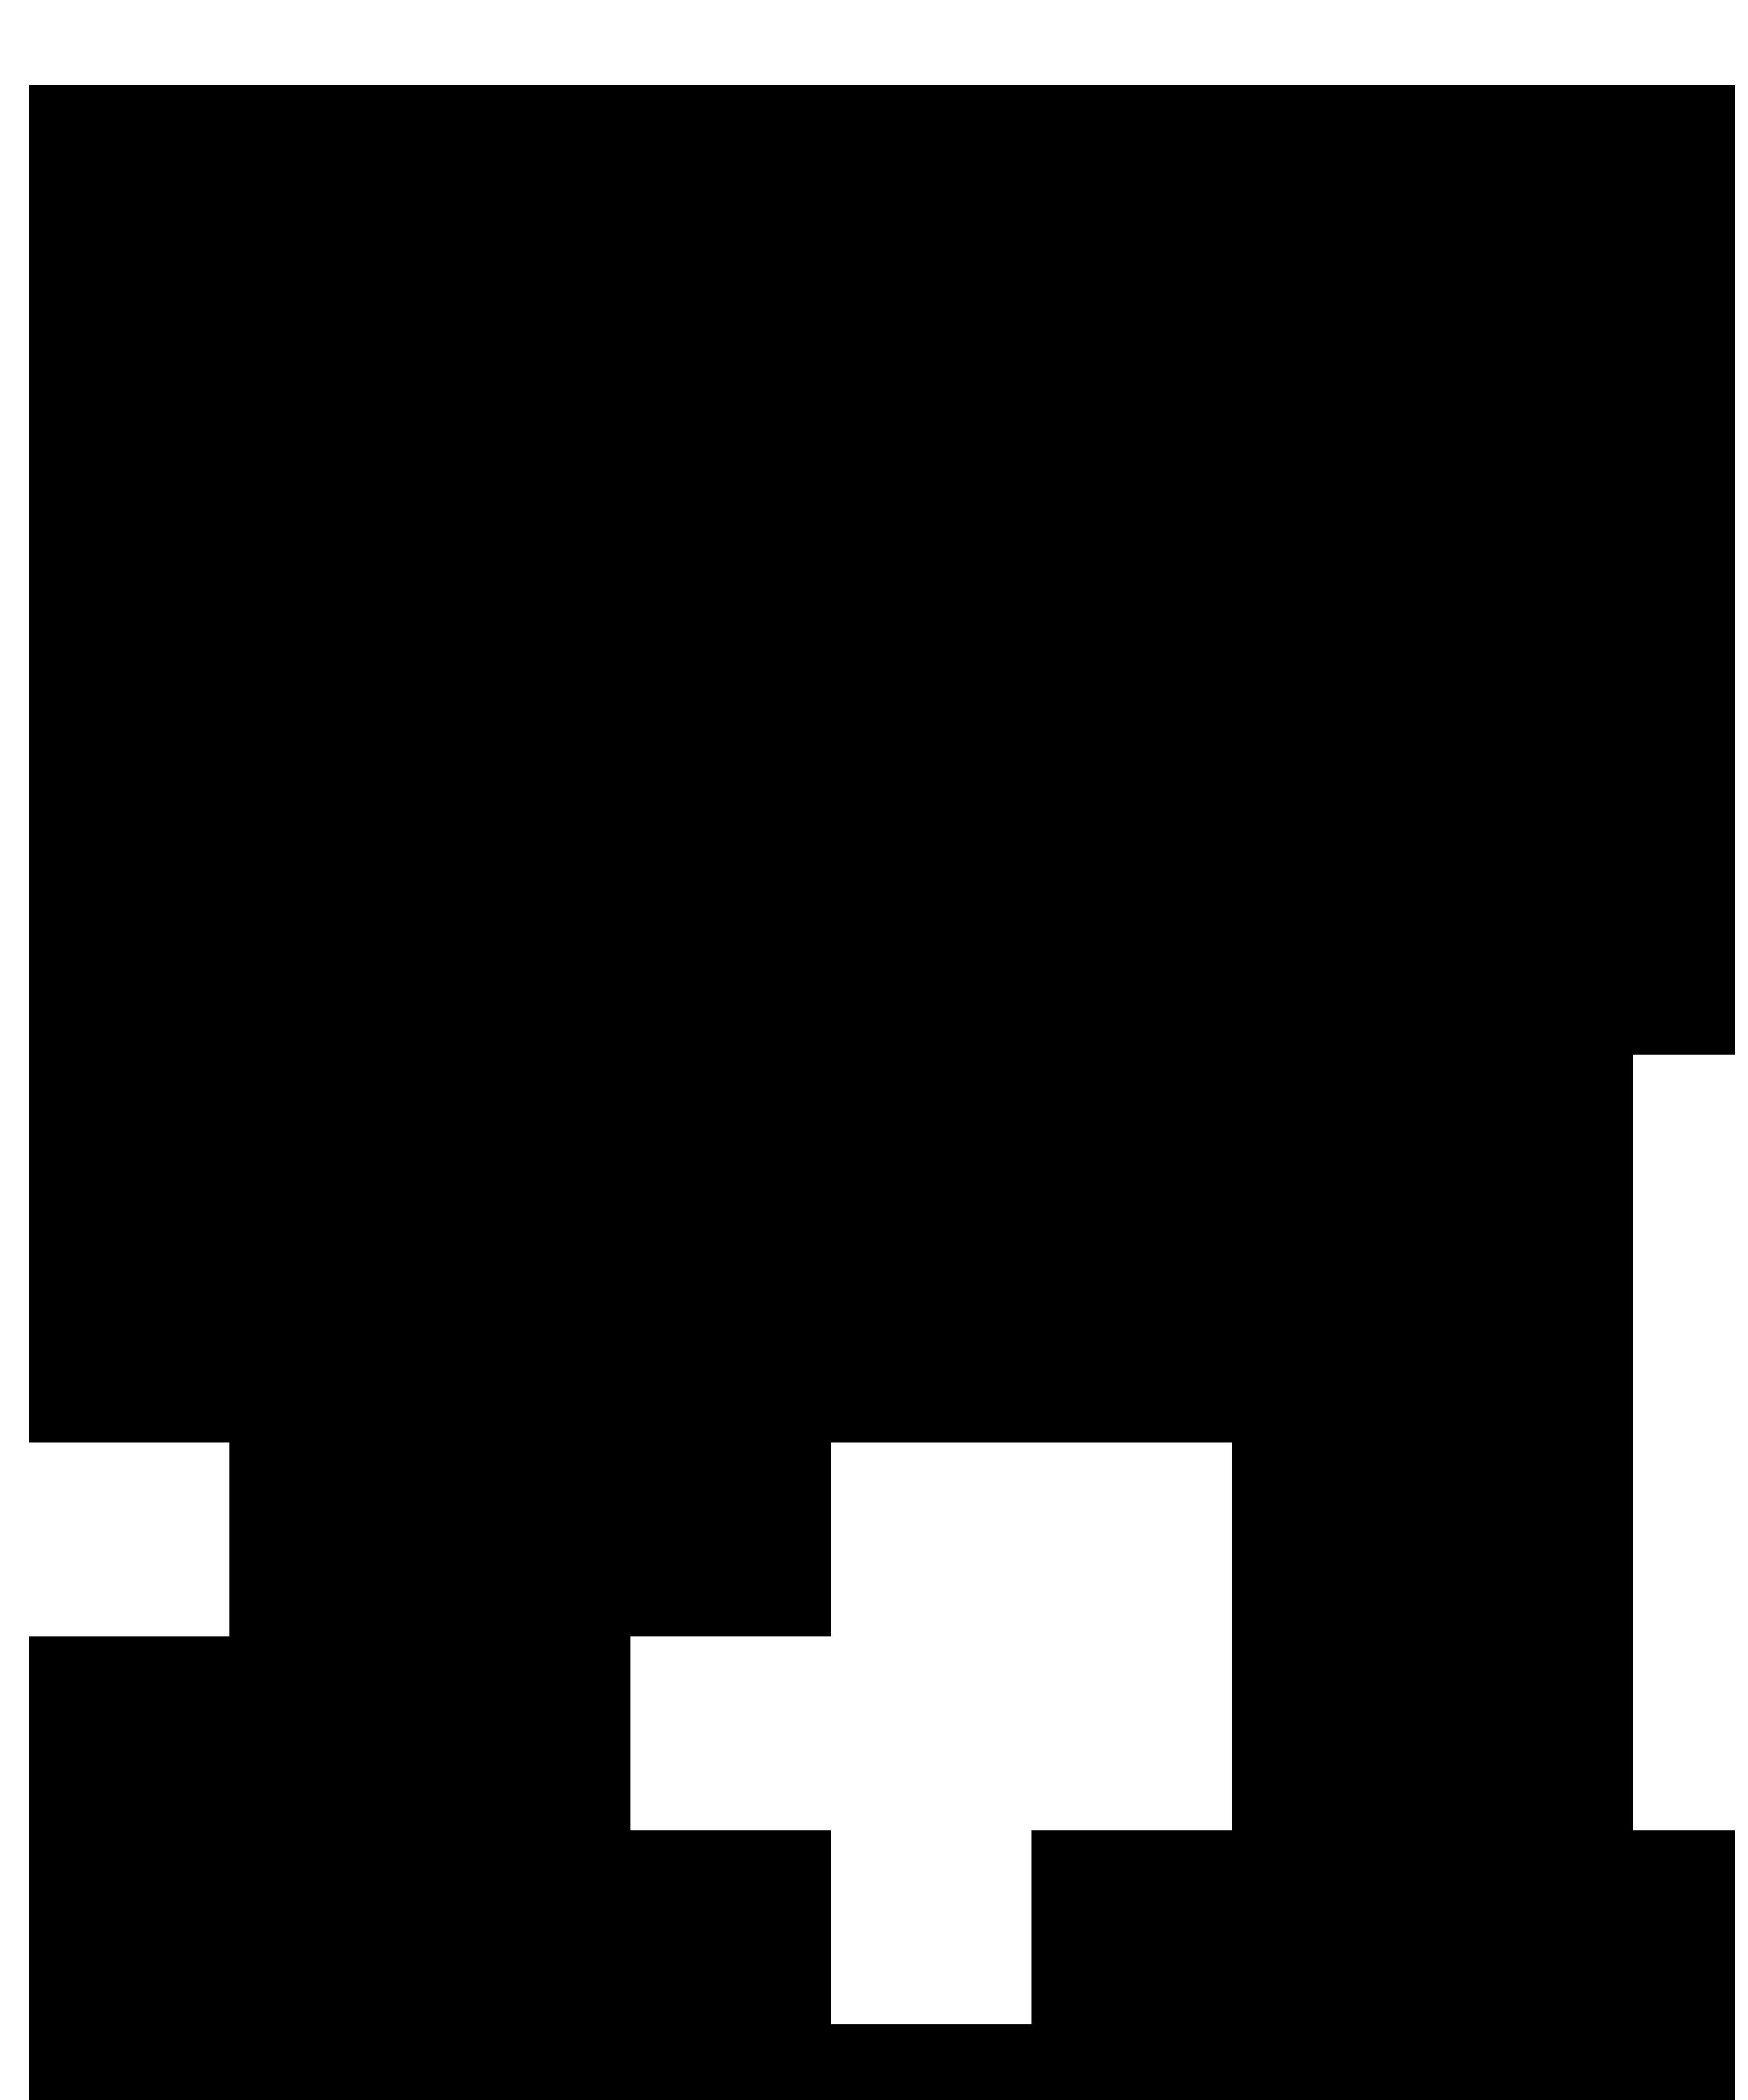 Noir Blanc 21 - logo